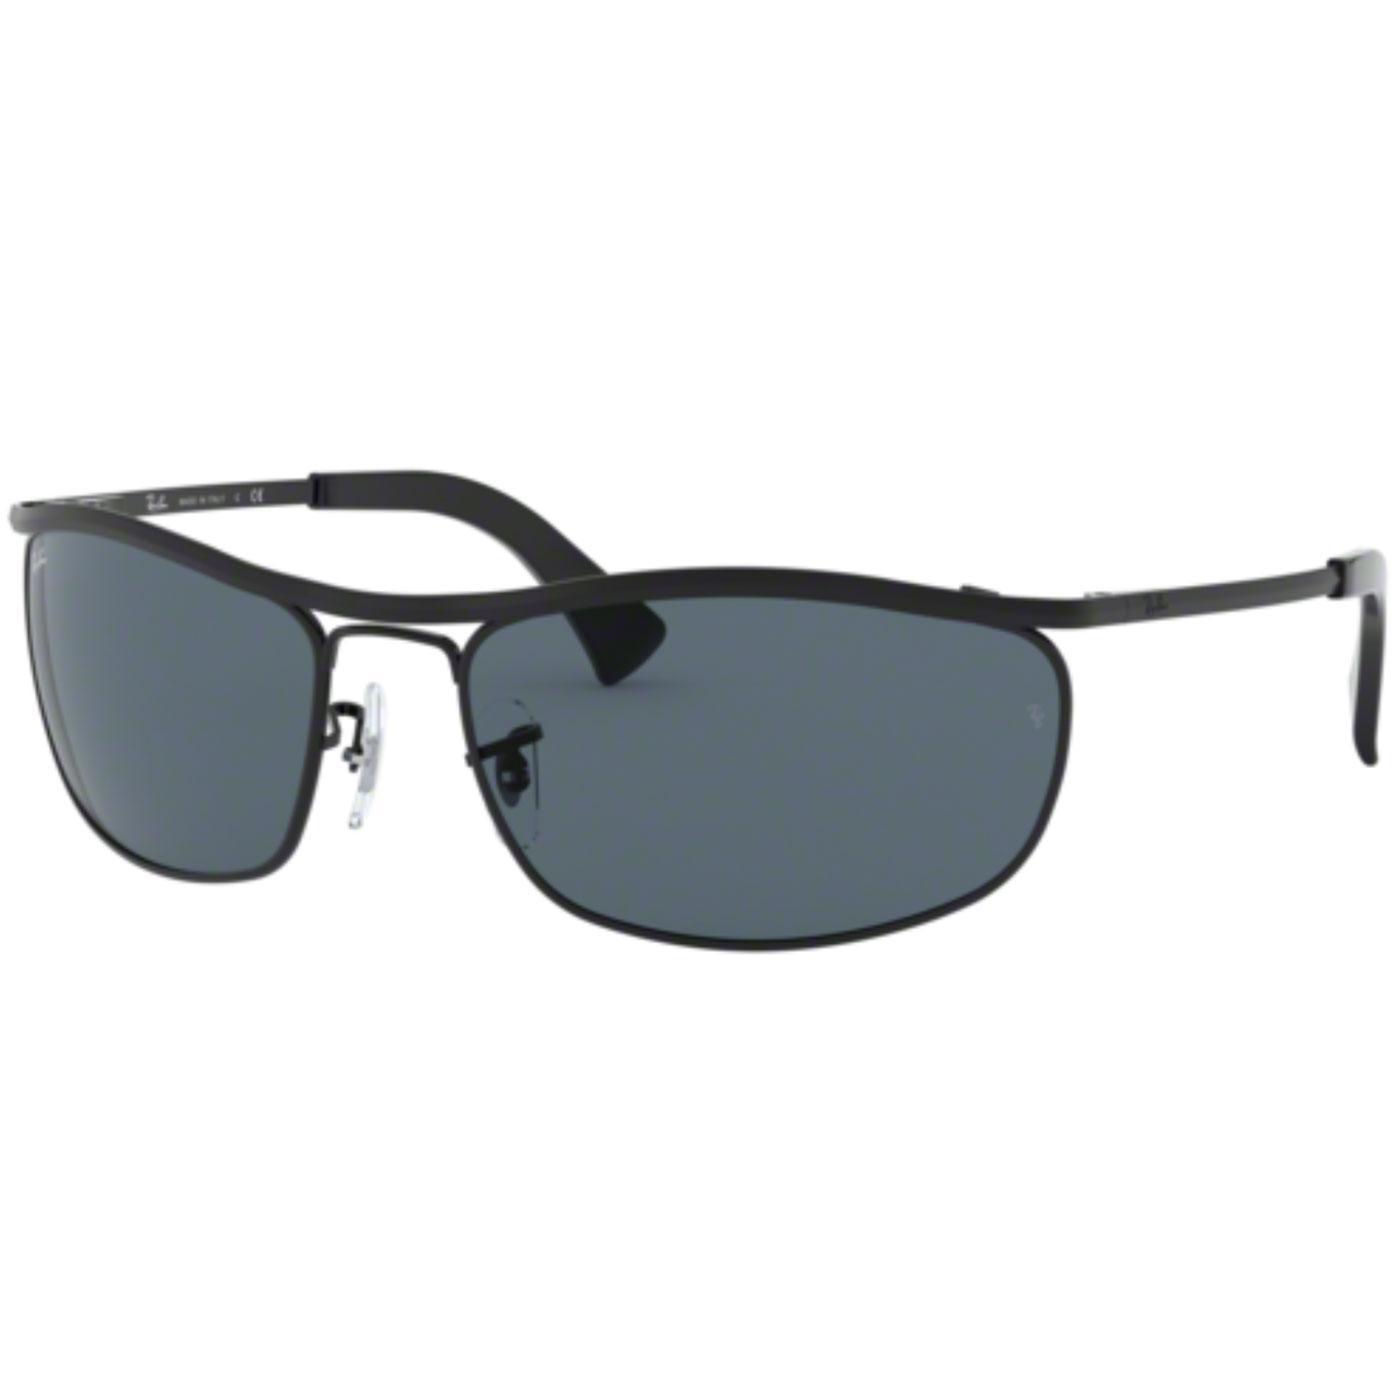 Olympian RAY-BAN Retro 60s Mod Icons Sunglasses B